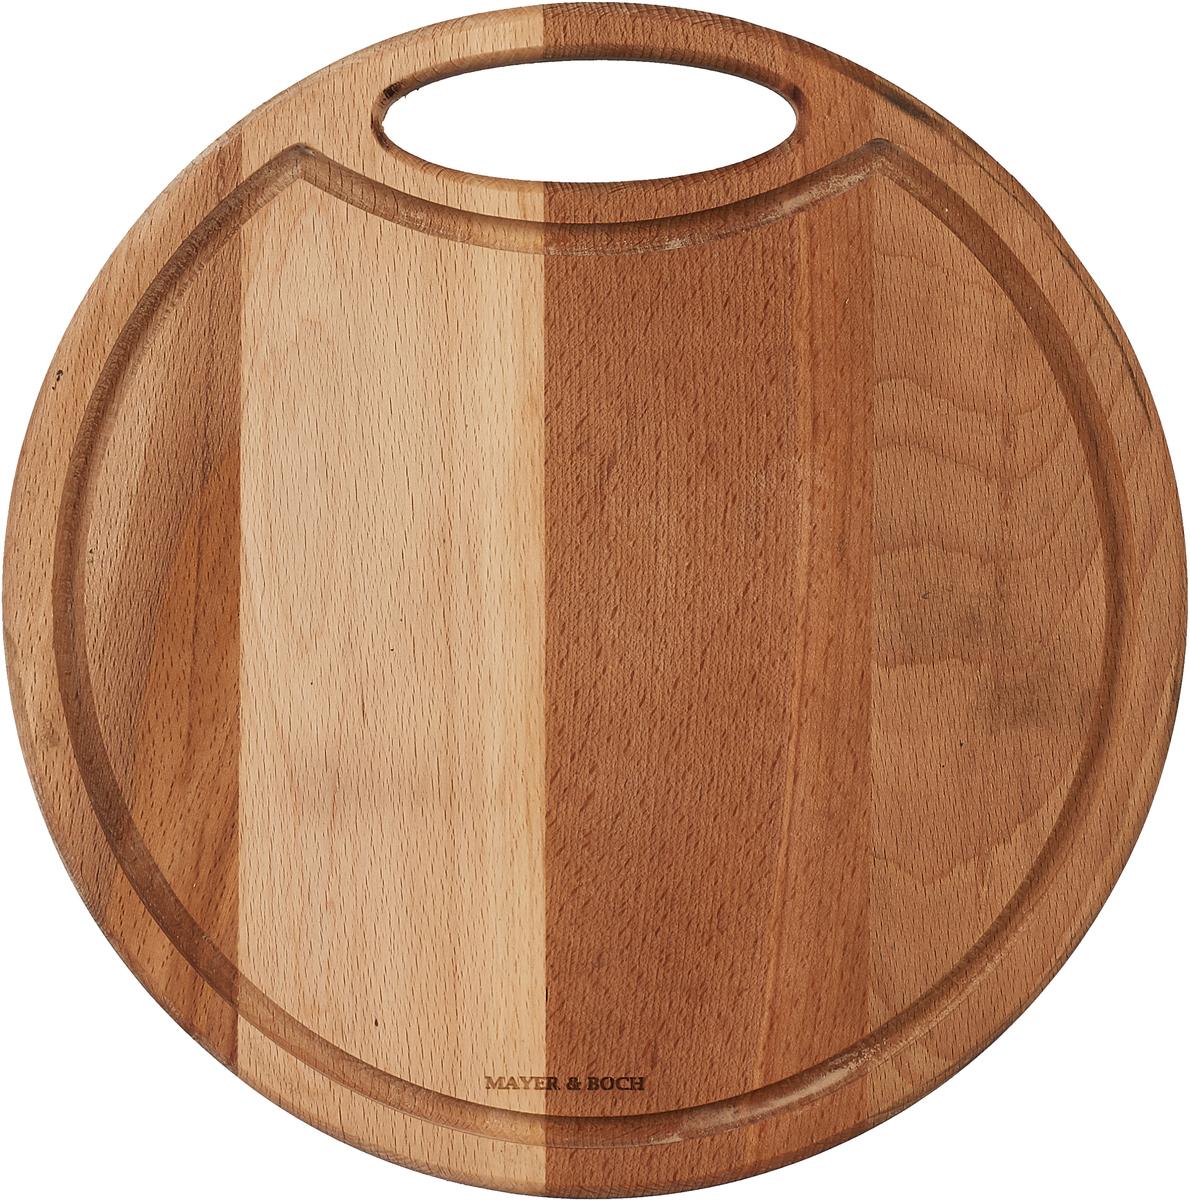 Разделочная доска Mayer & Boch, 40030, коричневый, 30 х 30 см разделочная доска бамбук 35х18 см mayer and boch мв 22588